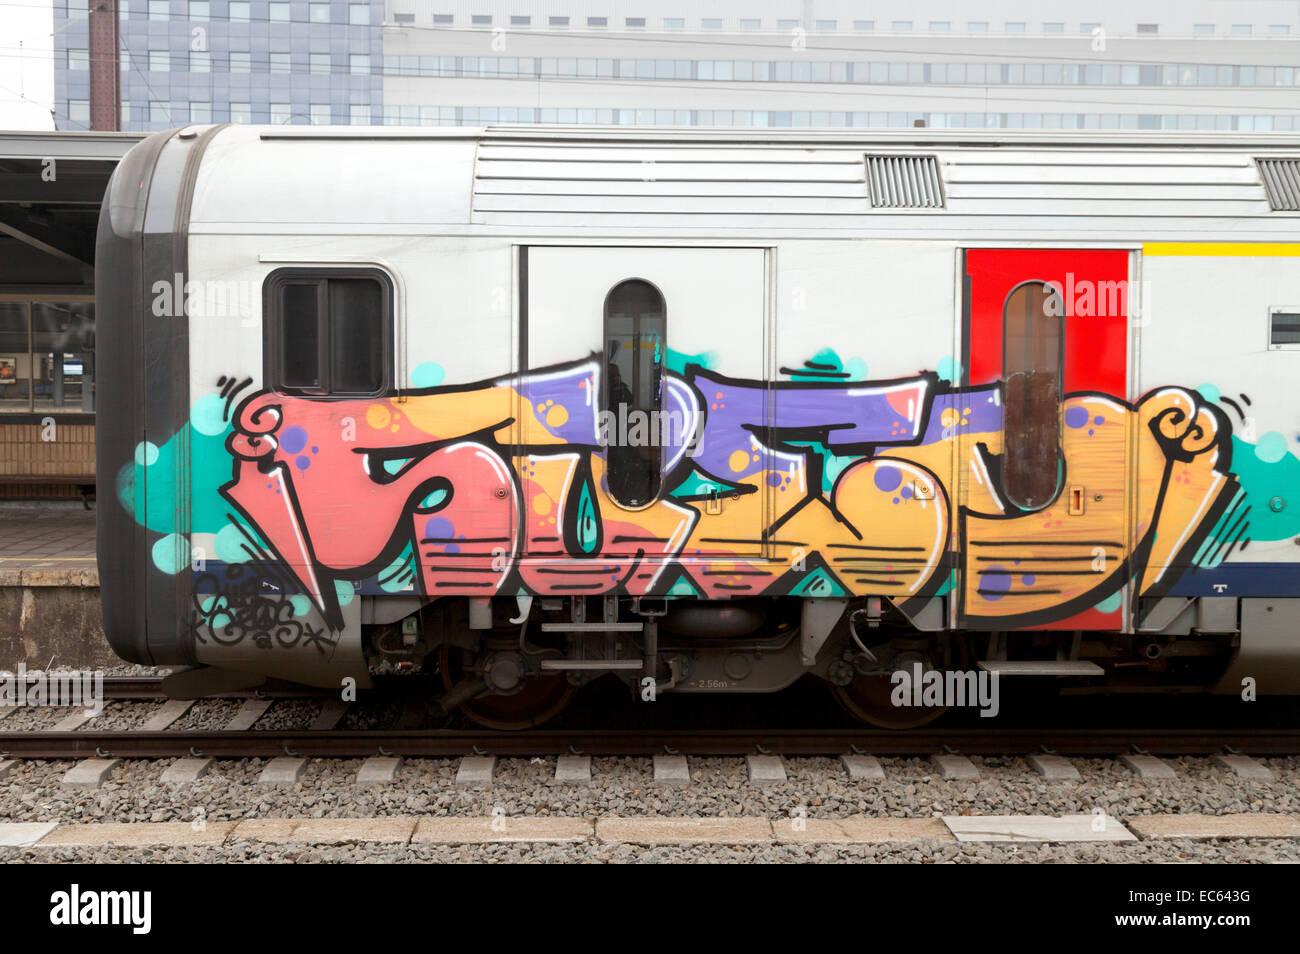 Colourful Graffiti On A Train In Belgium Europe Stock Image